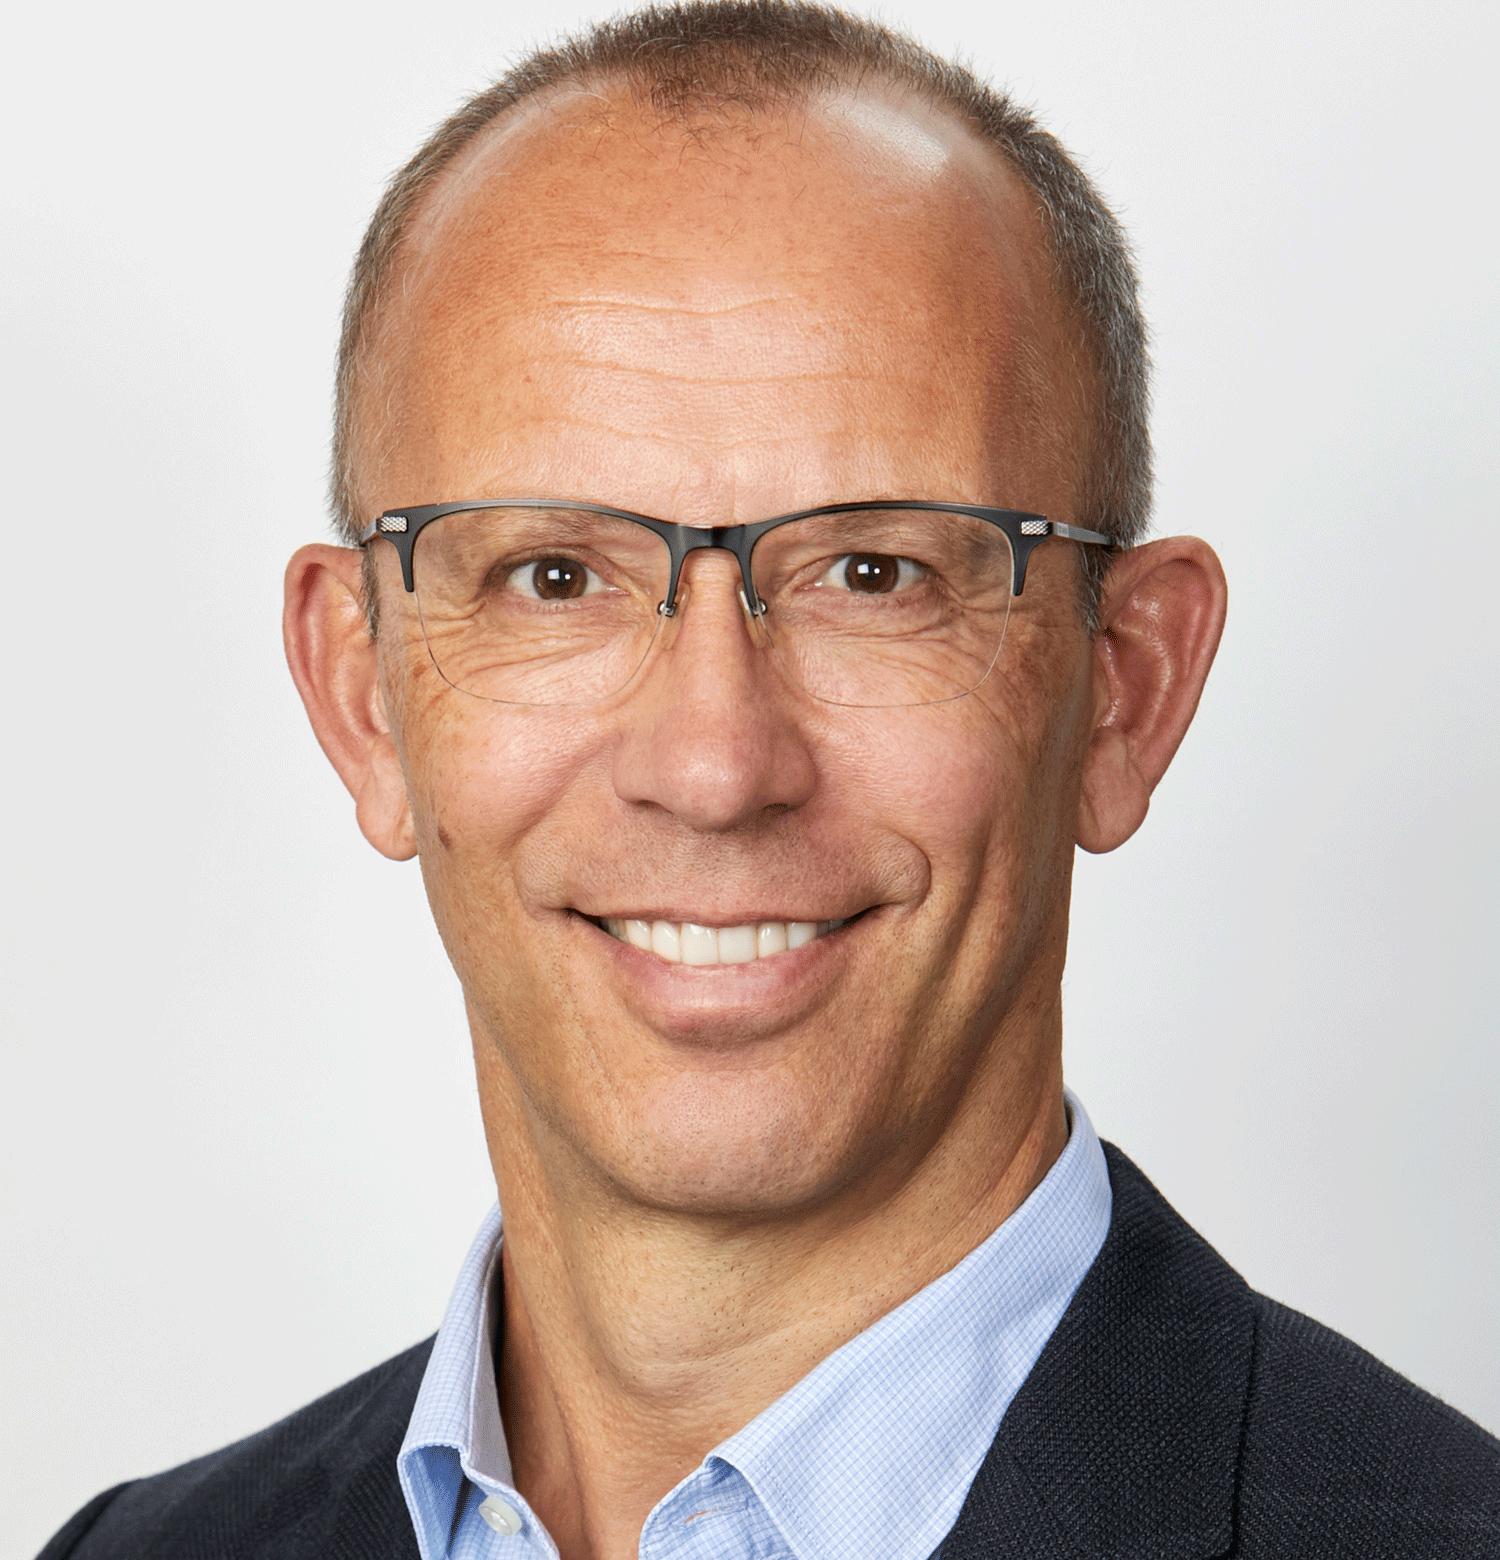 Michael Eidel